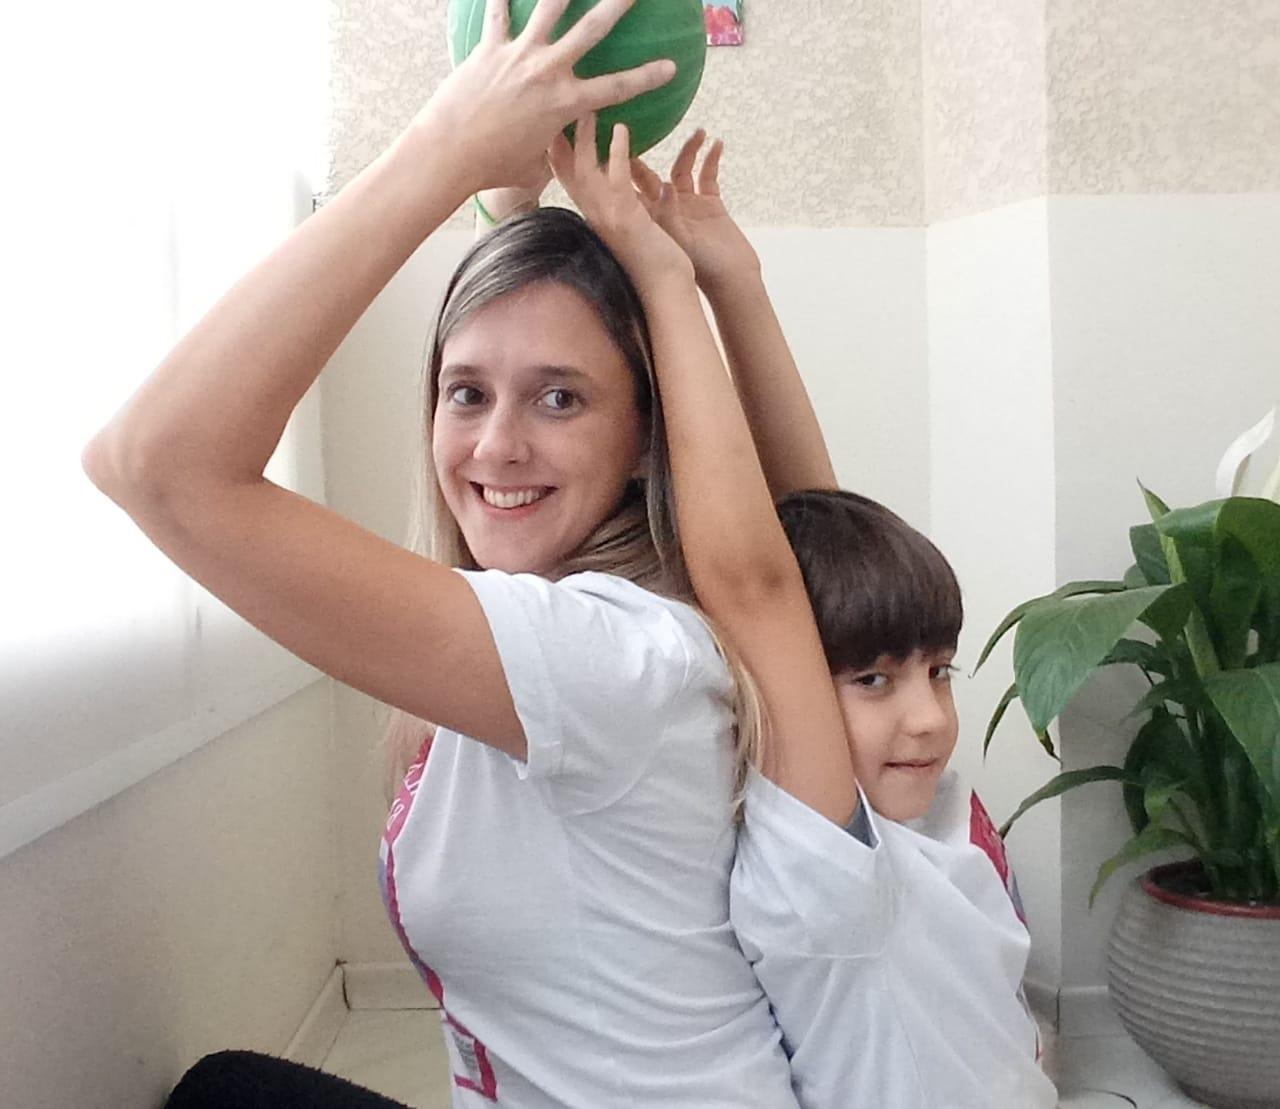 Pilates bambini no vipzinho